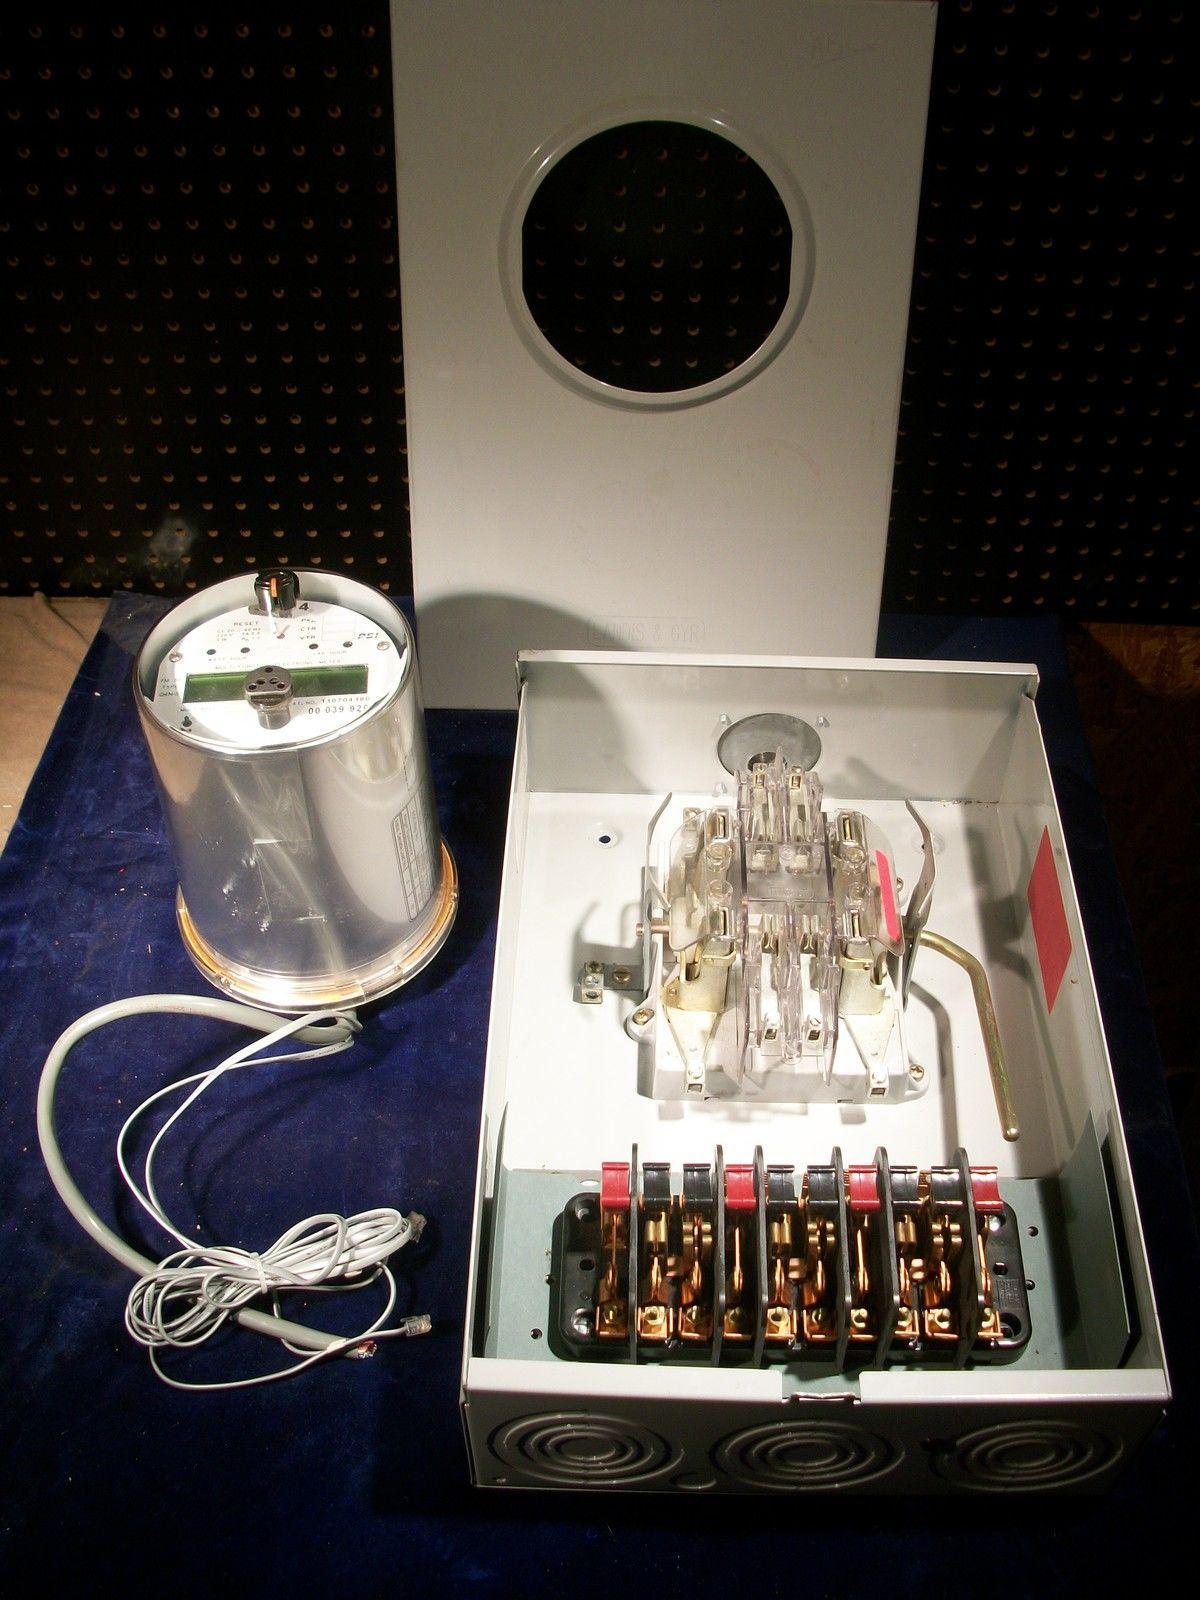 7 jaw meter socket wiring diagram narva ultima 225 hid landis and gyr 600 v 8 9804 8521 ebay